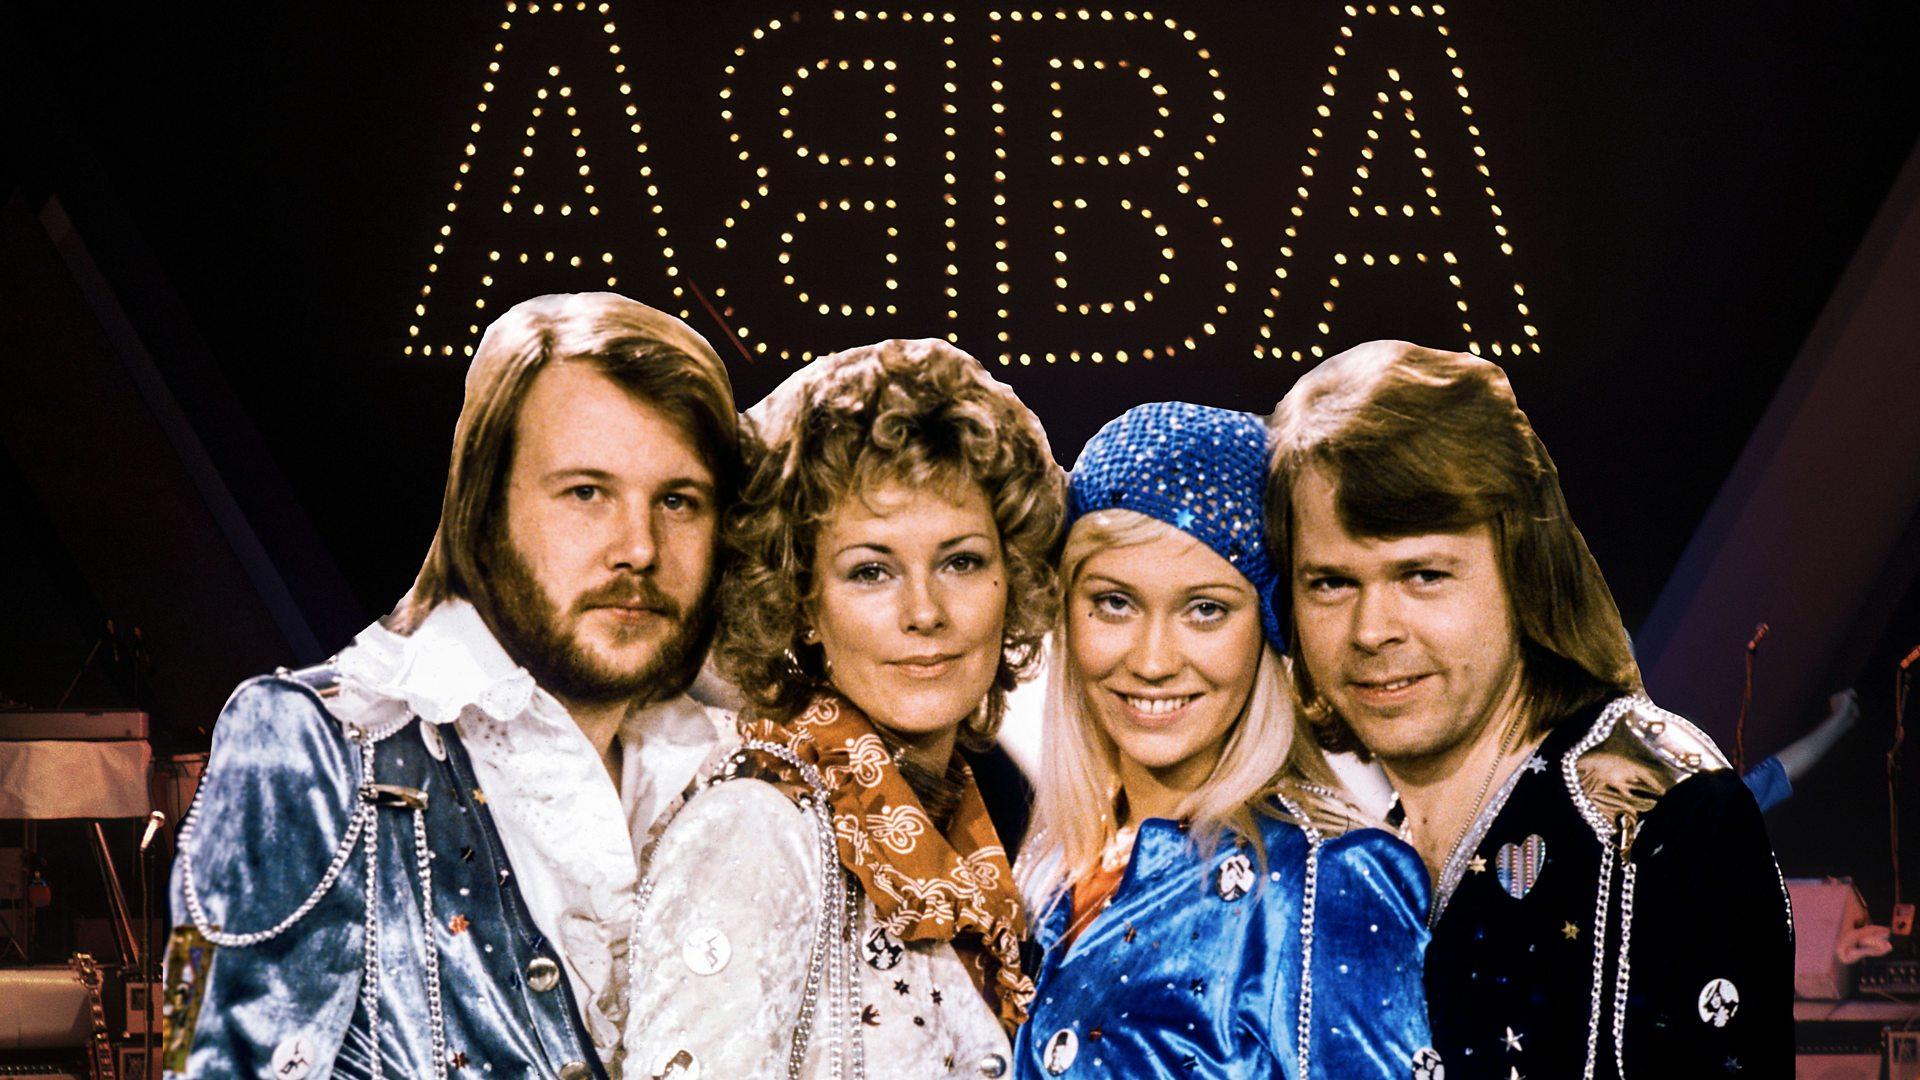 ABBA ετοιμάζουν reunion για την 50η επέτειό